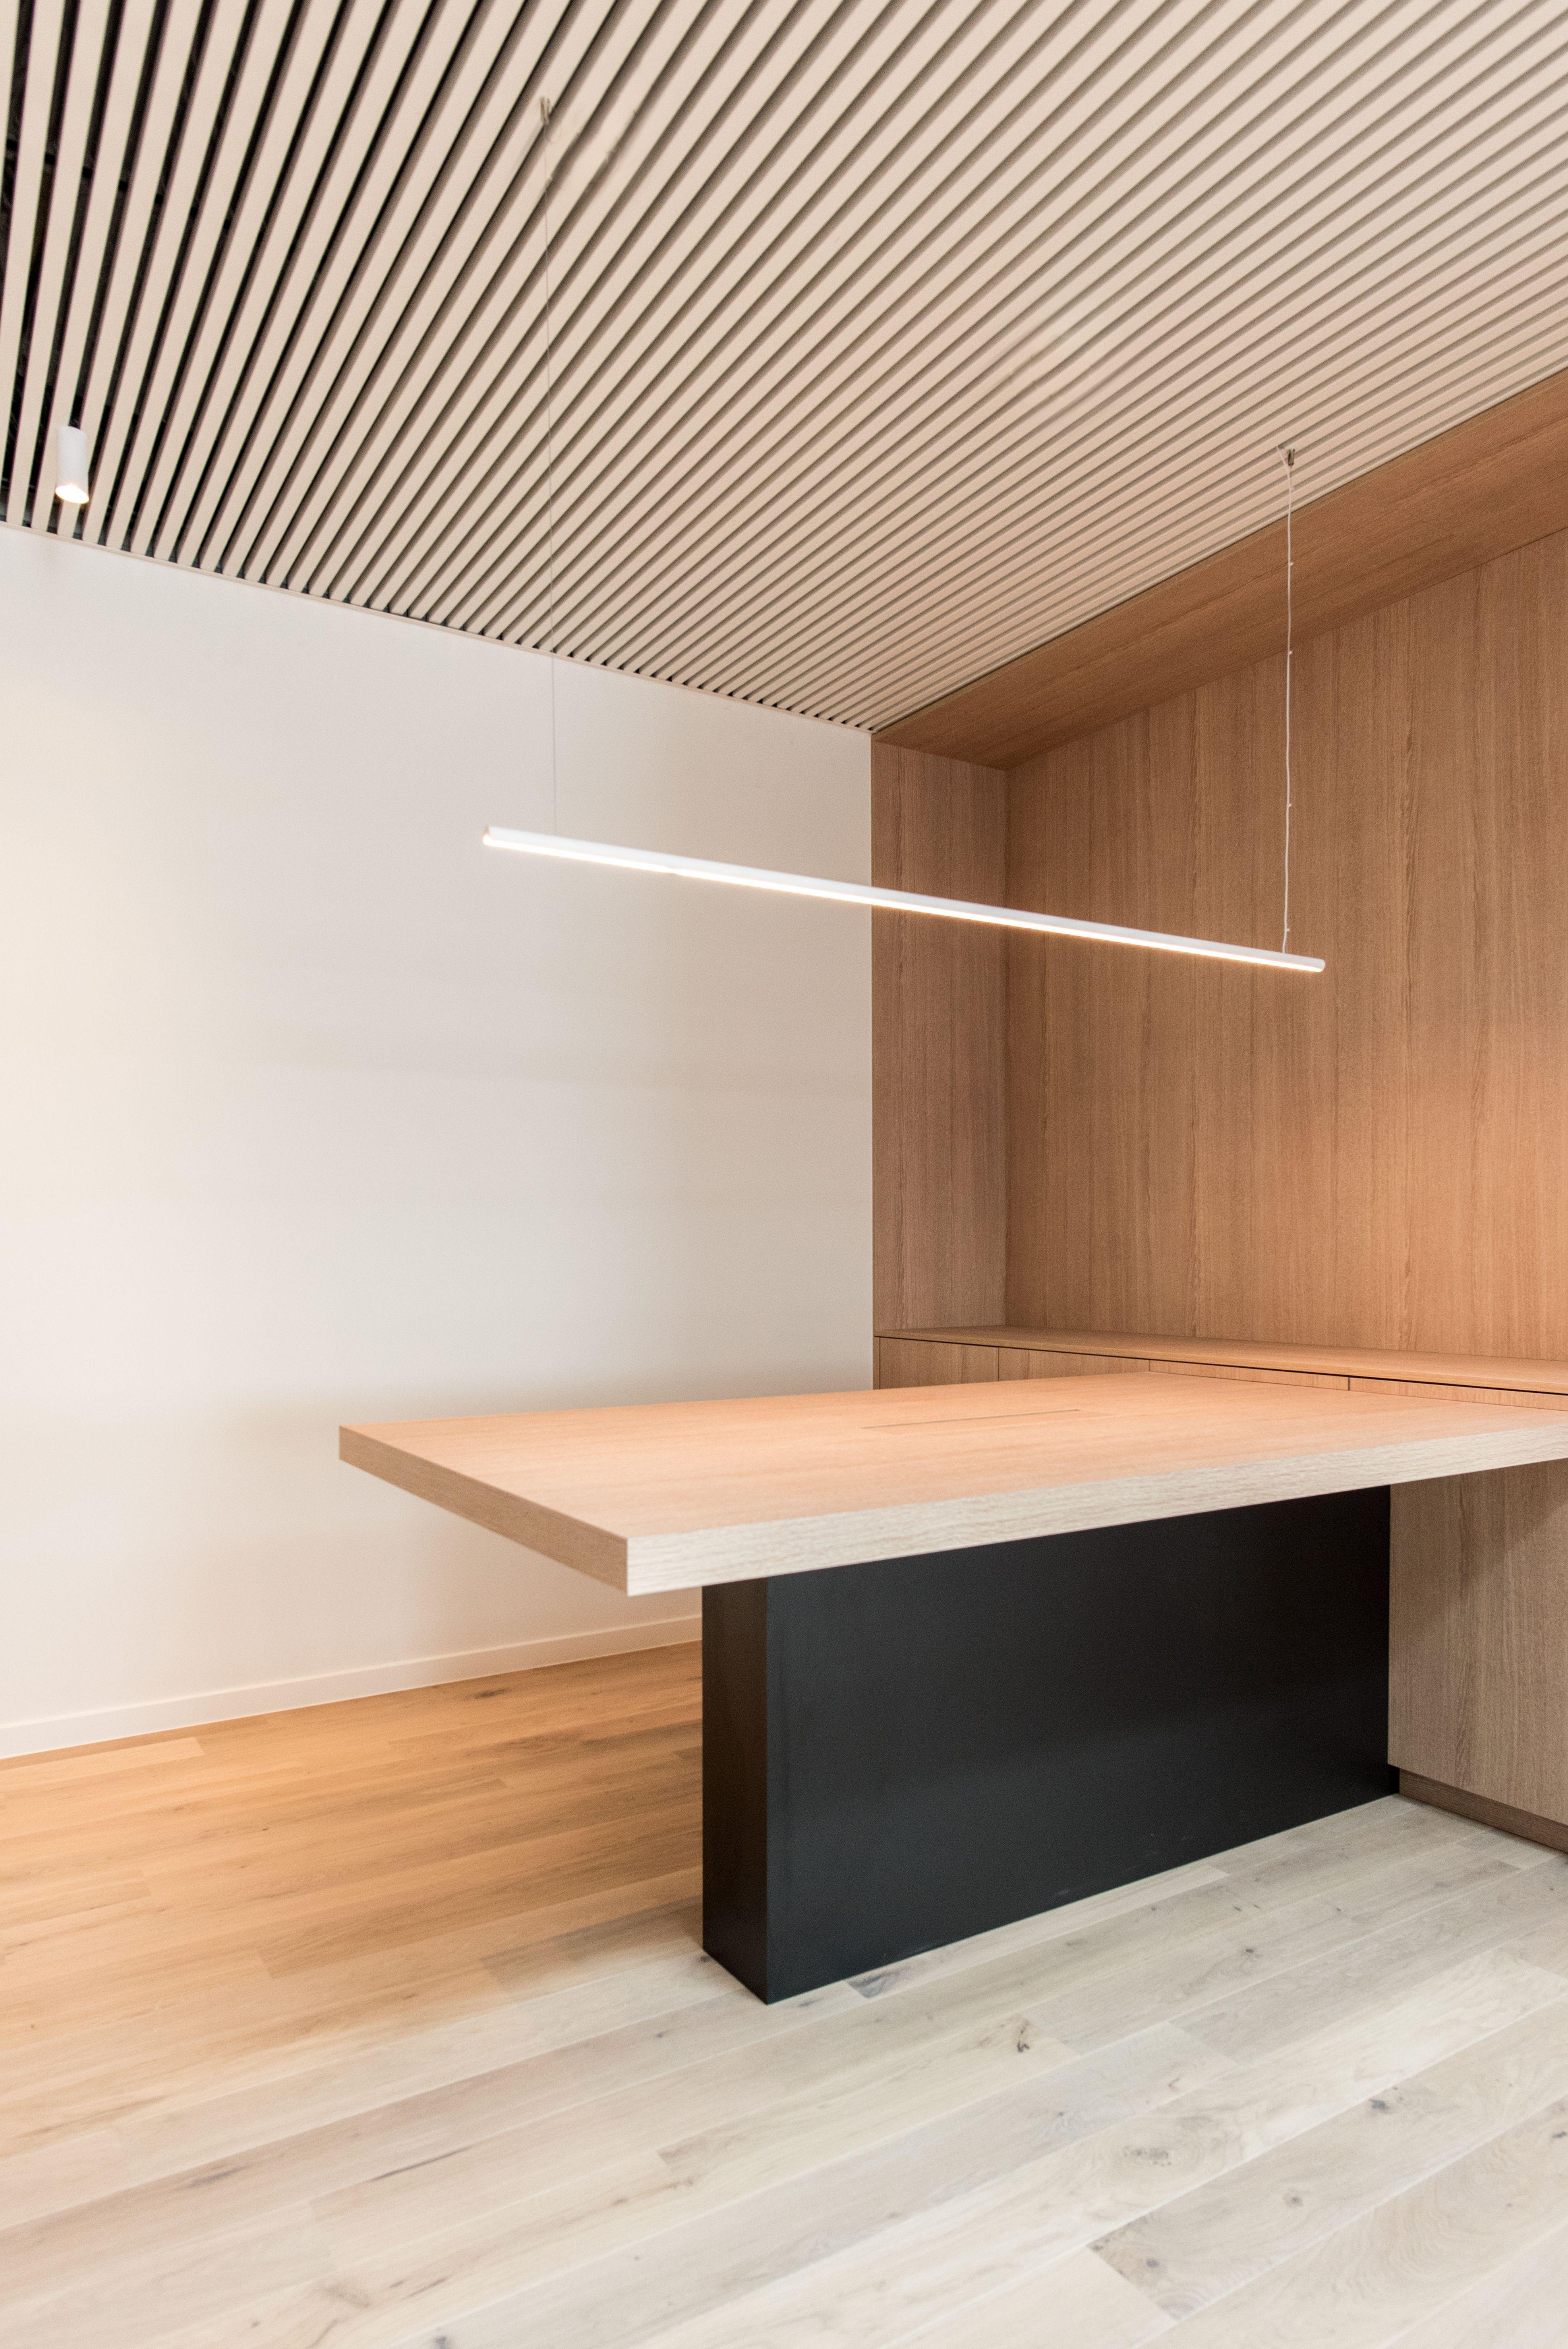 V Office Dieter Vander Velpen Architects Office Ceiling Design Architect Office Interior Office Interiors